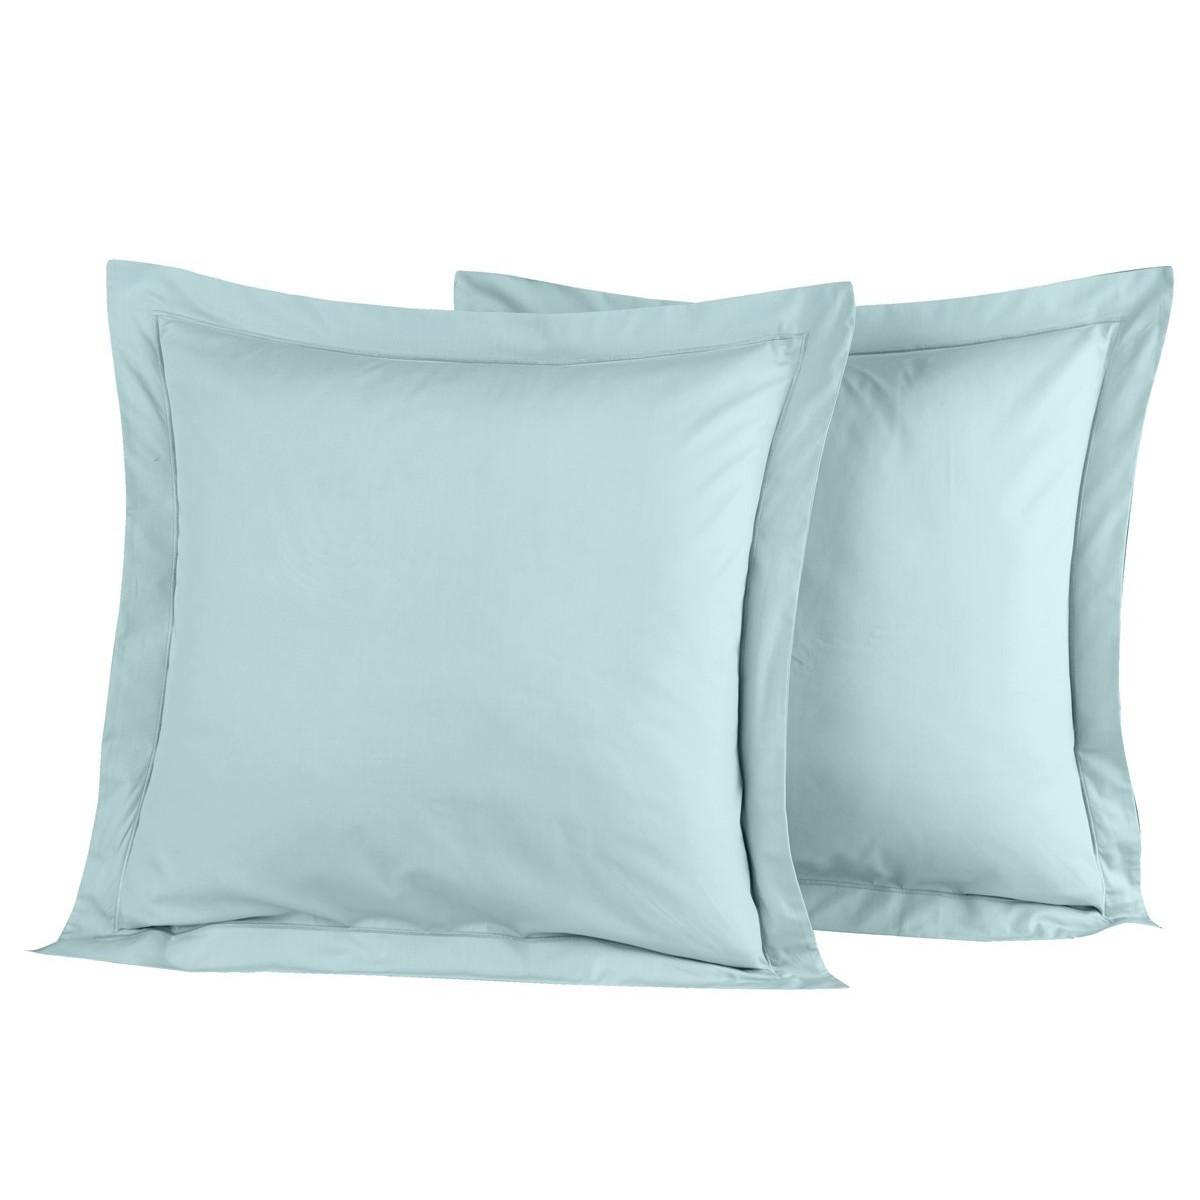 Lot de 2 taies d'oreiller en percal Bleu Arctic 65x65 cm